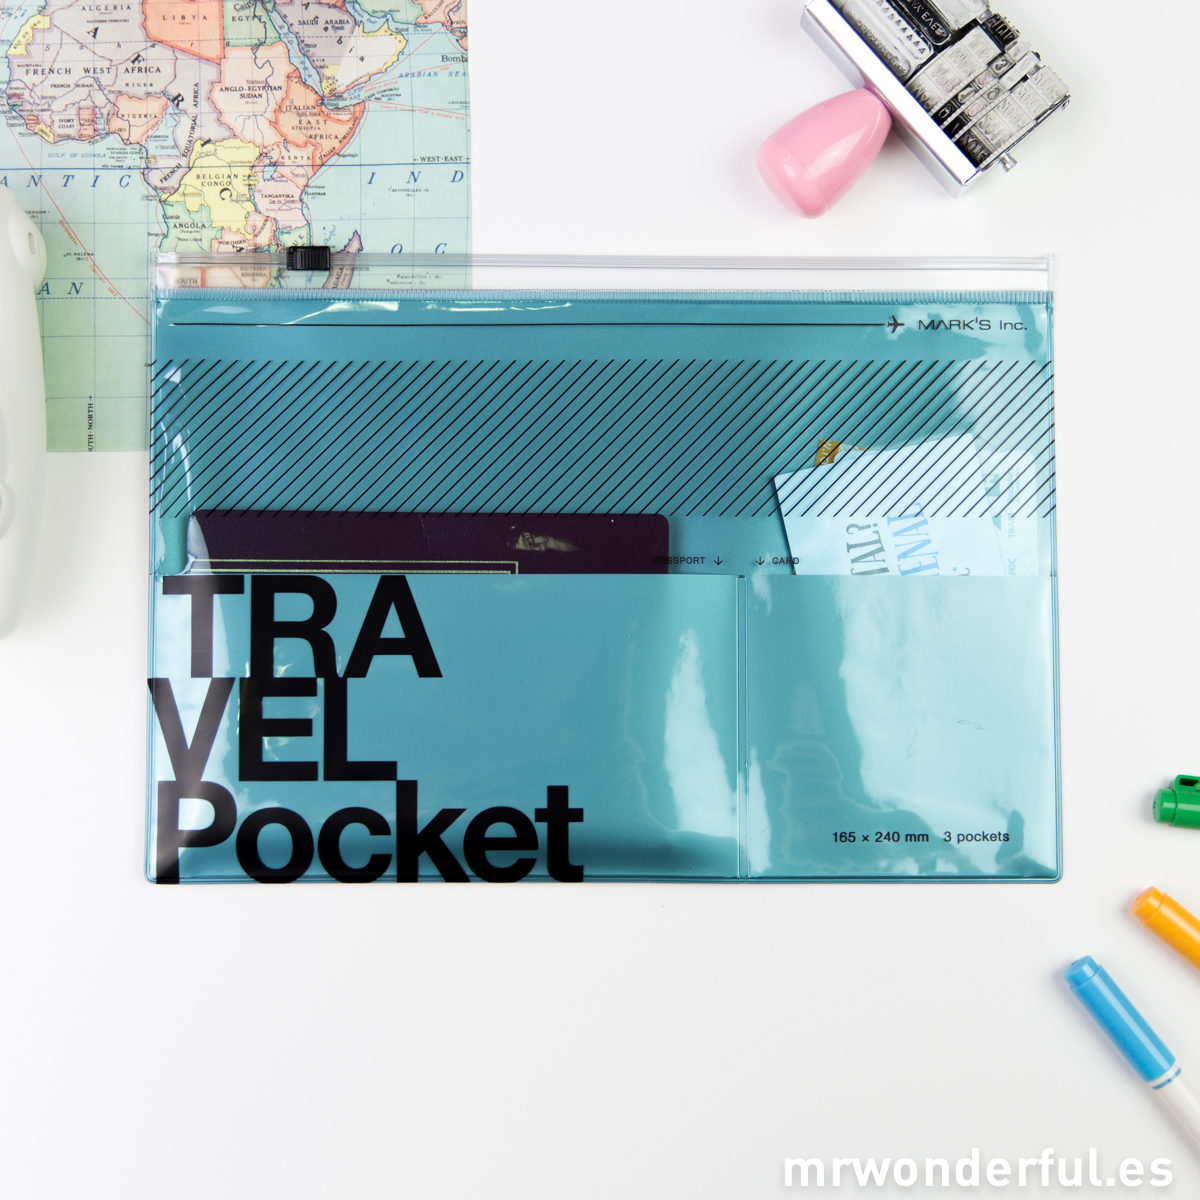 mrwonderful_TVK-VC1-MBL_portadocumentos-viaje-azul-4